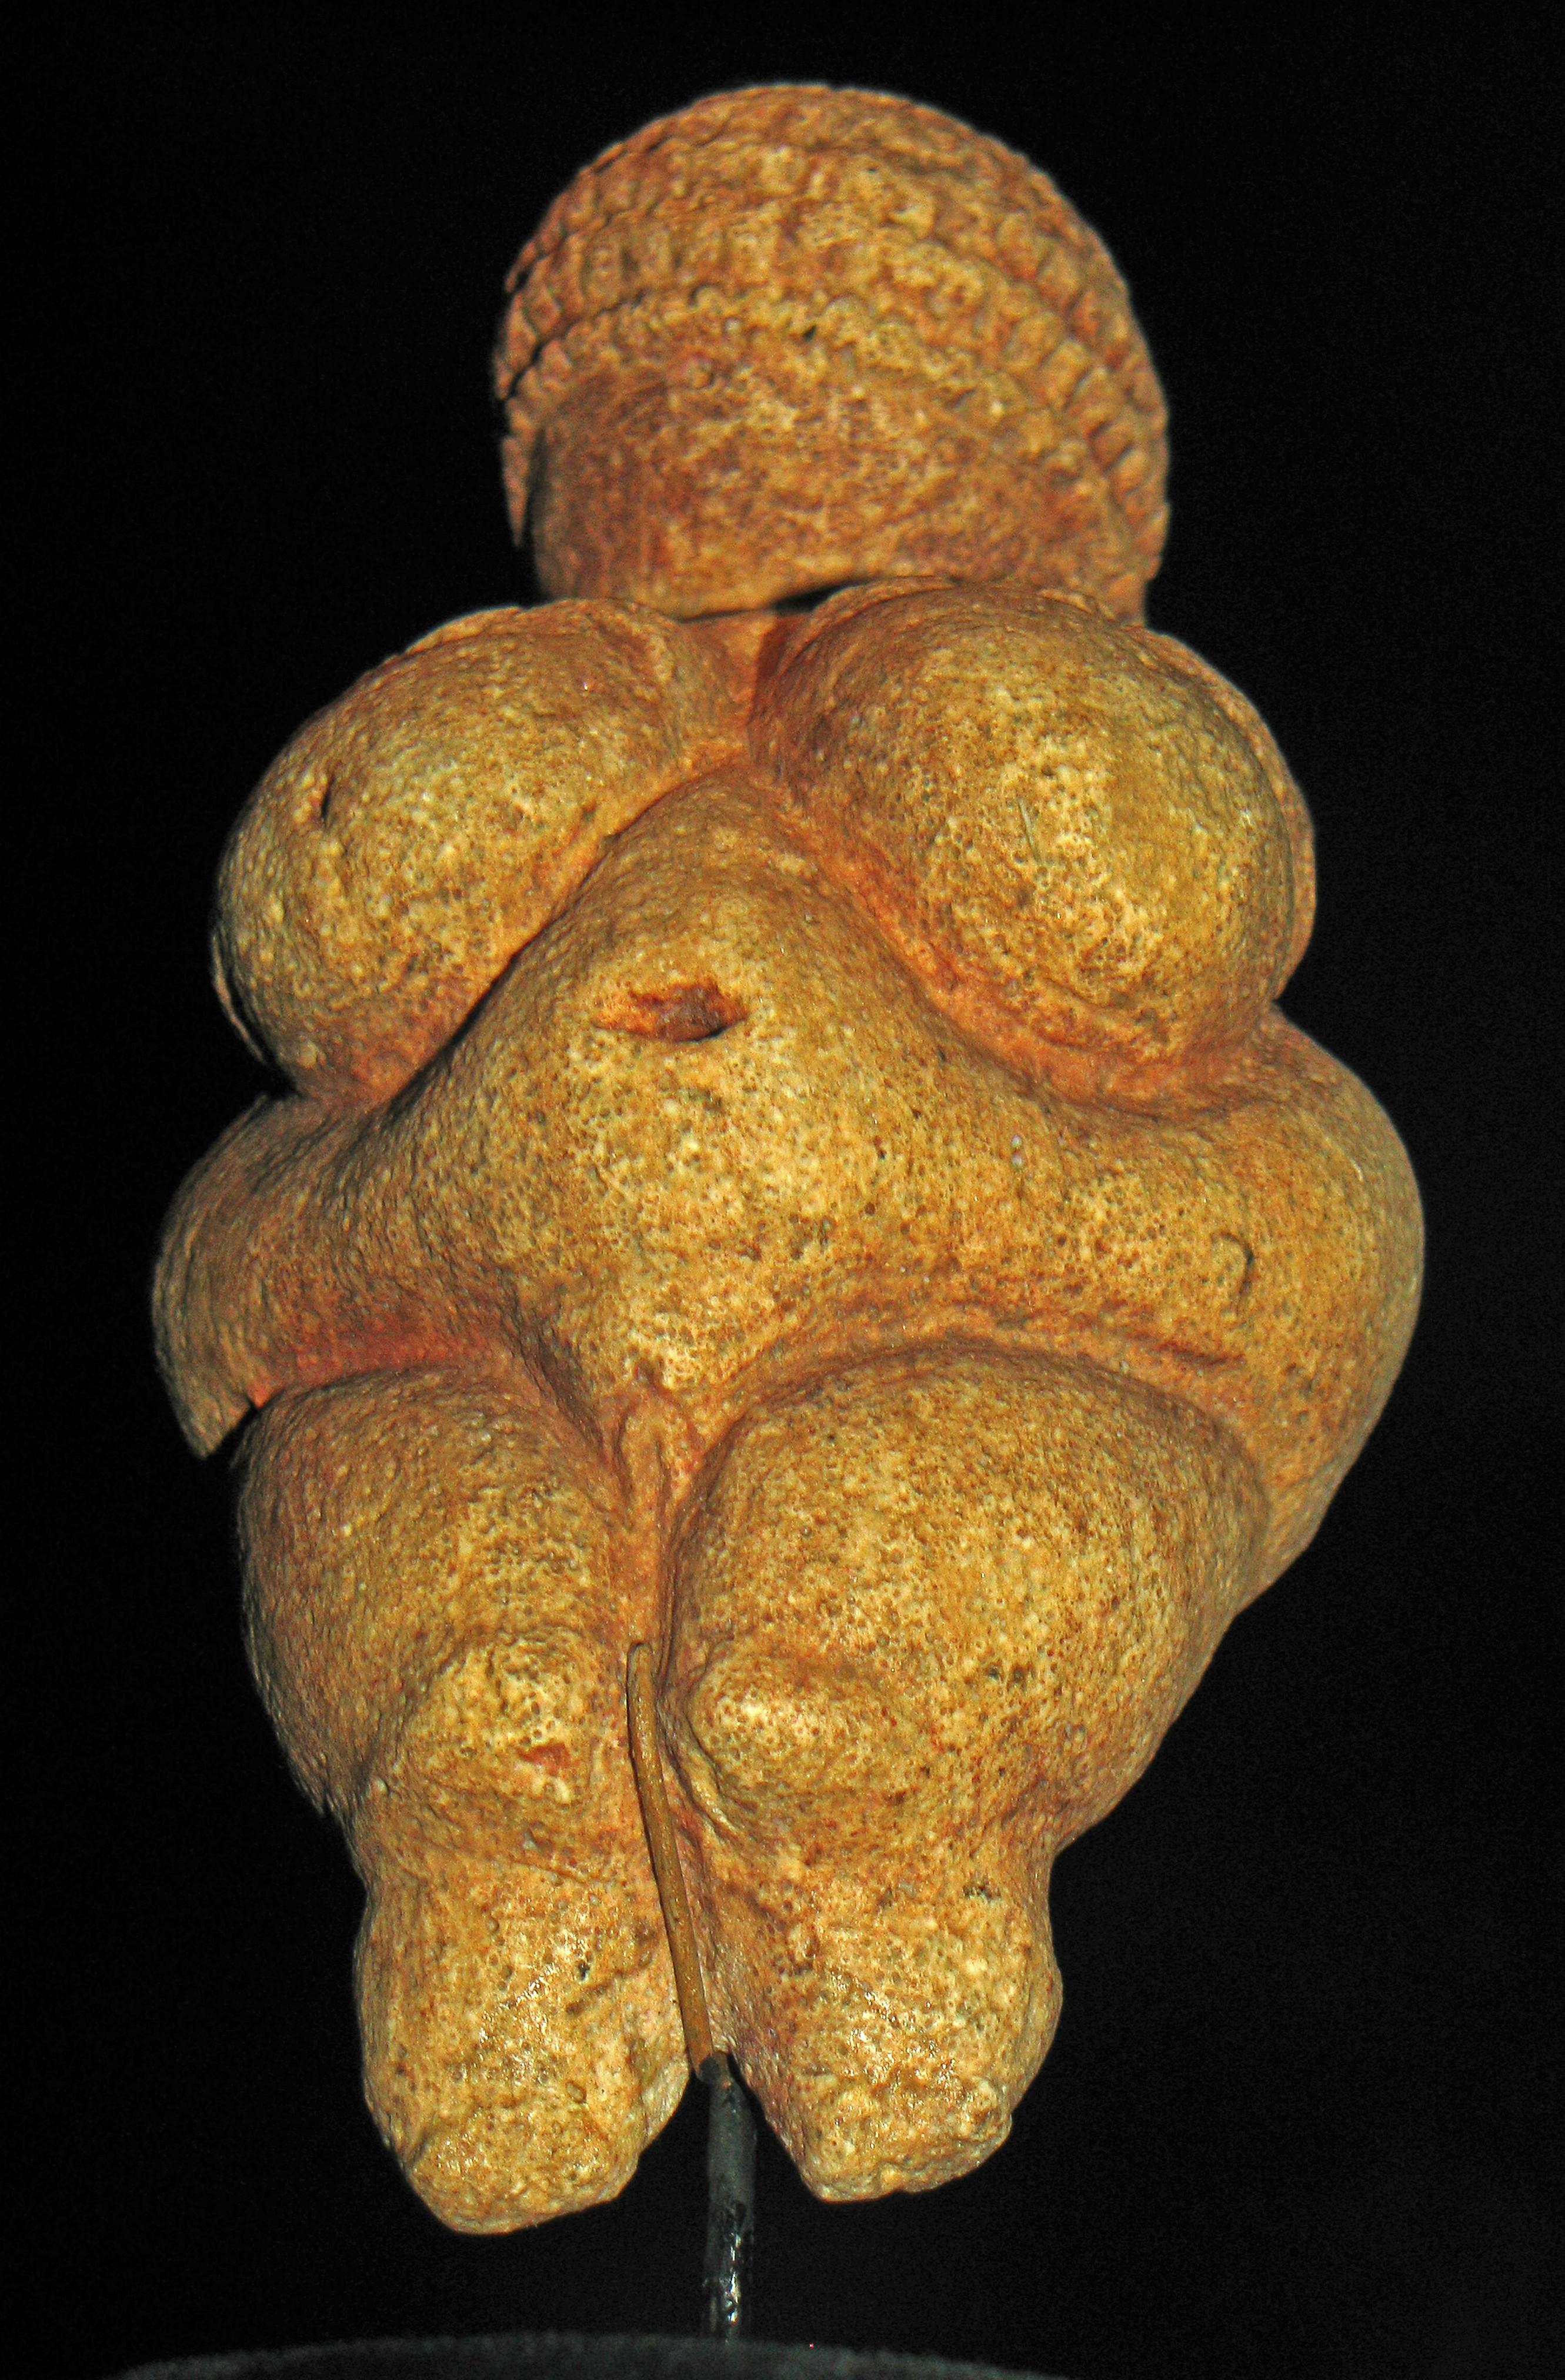 venus of willendorf Nude woman (venus of willendorf), c 28,000-25,000 bce, limestone, 4 1/4 high (naturhistorisches museum, vienna) created by beth harris and steven zucker.